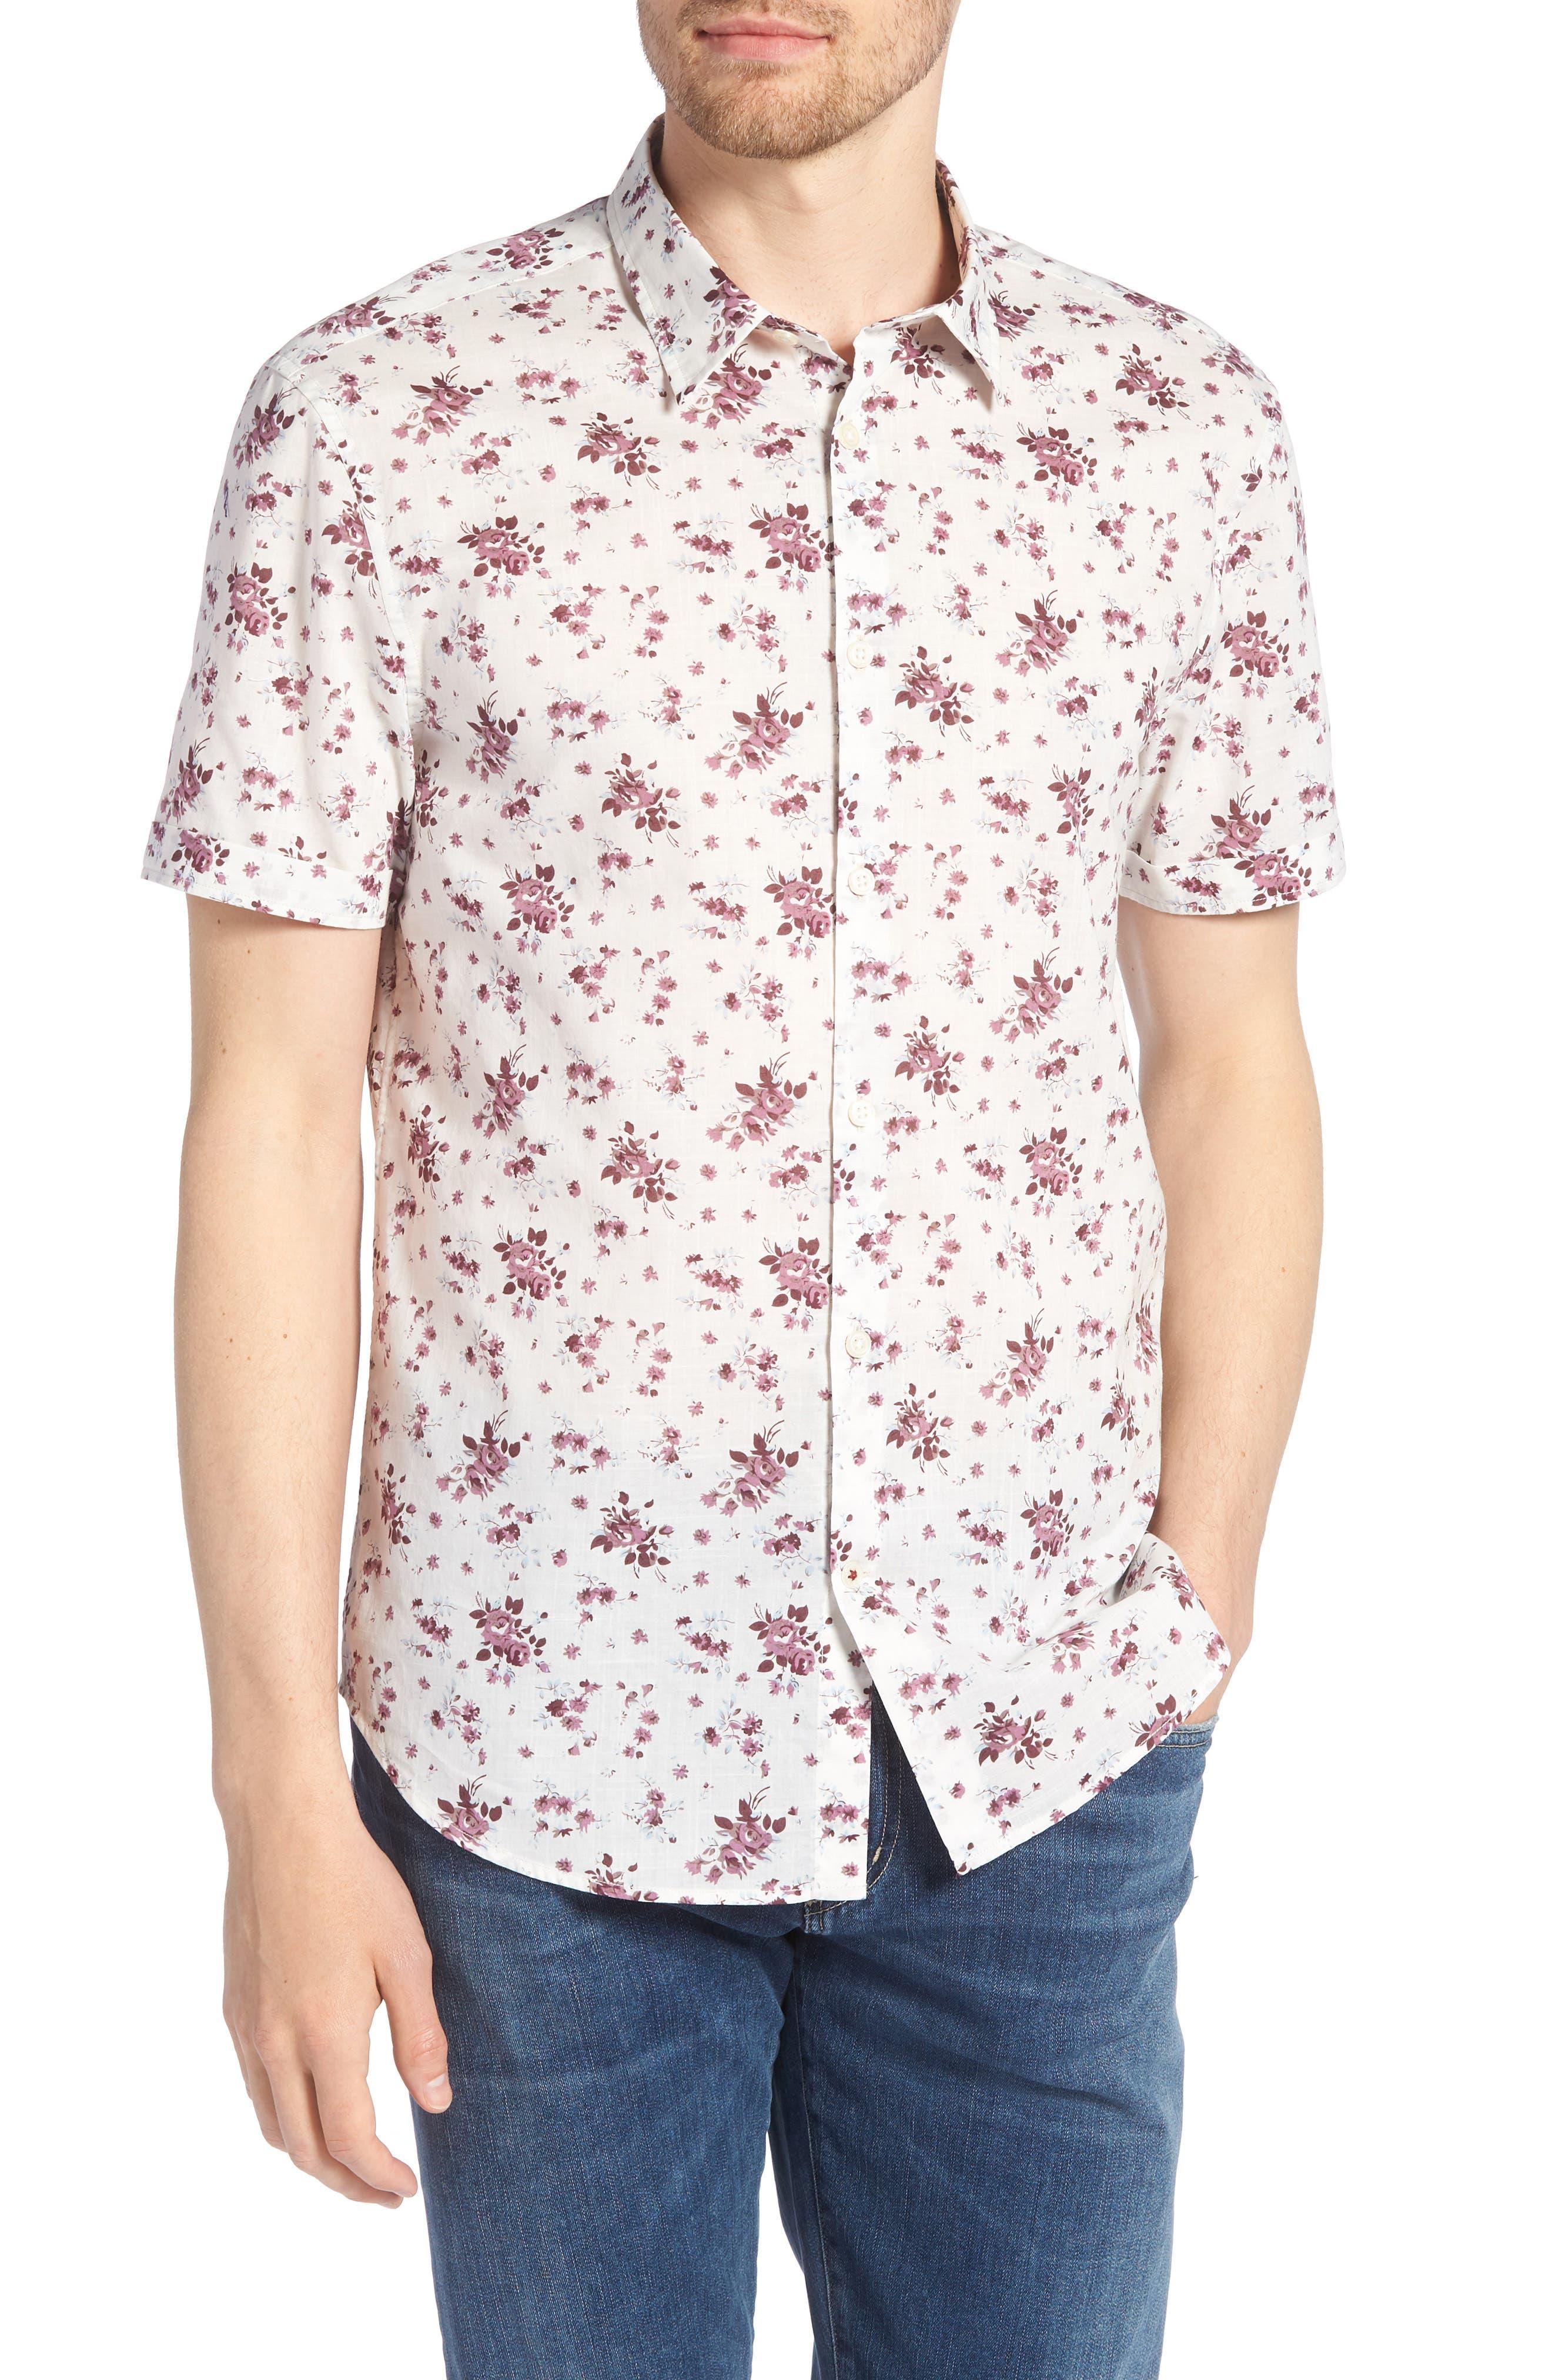 Regular Fit Floral Woven Shirt,                         Main,                         color, 661